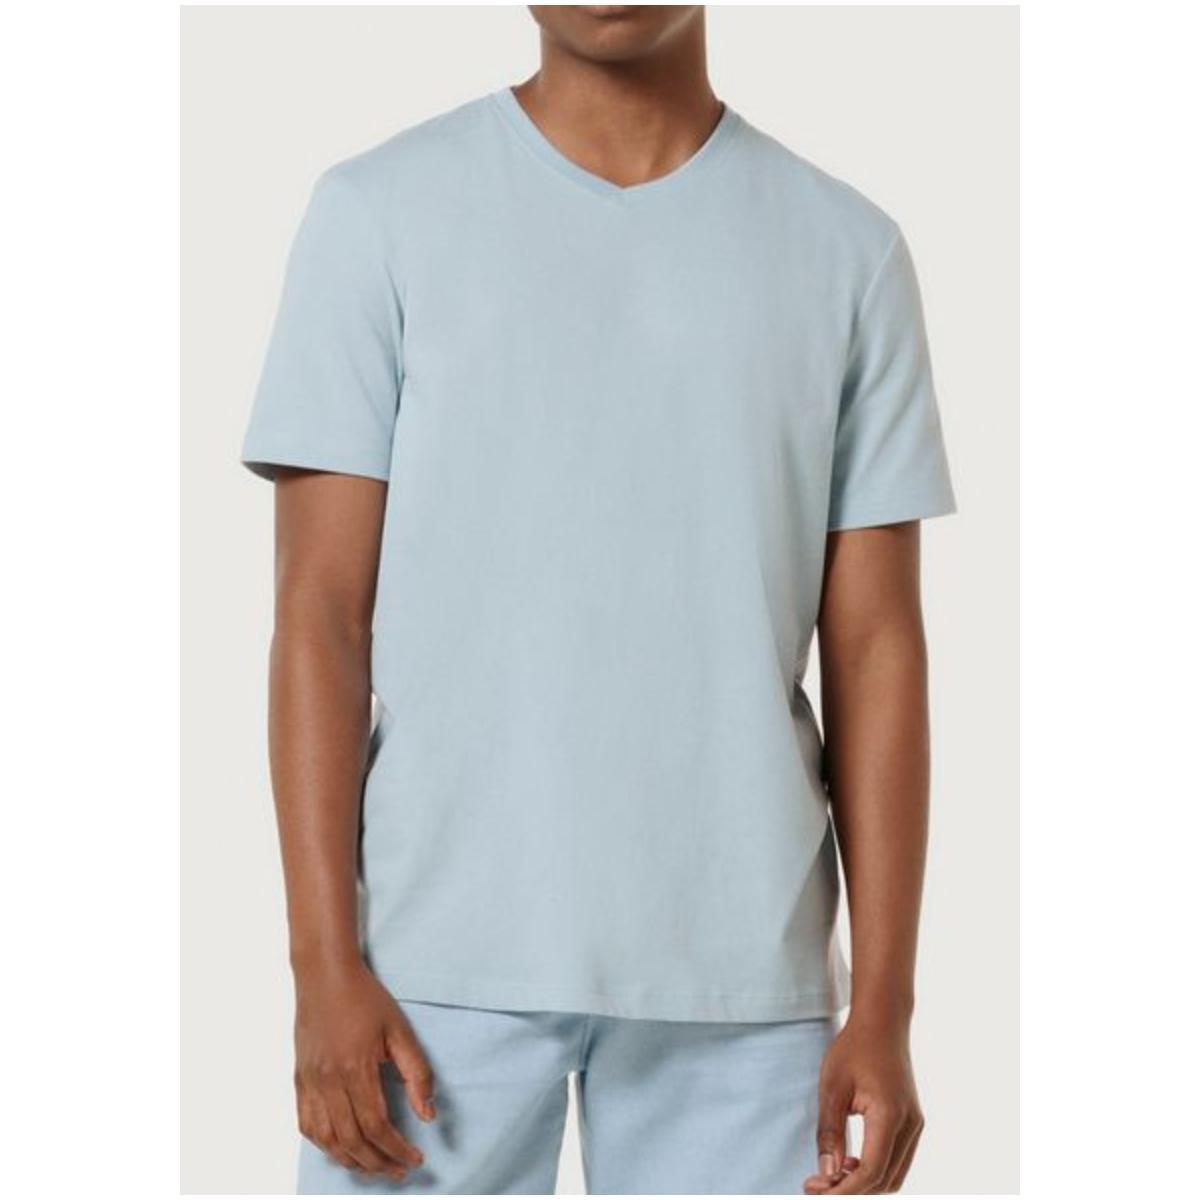 Camiseta Masculina Hering 022b Av7en Azul Bebê